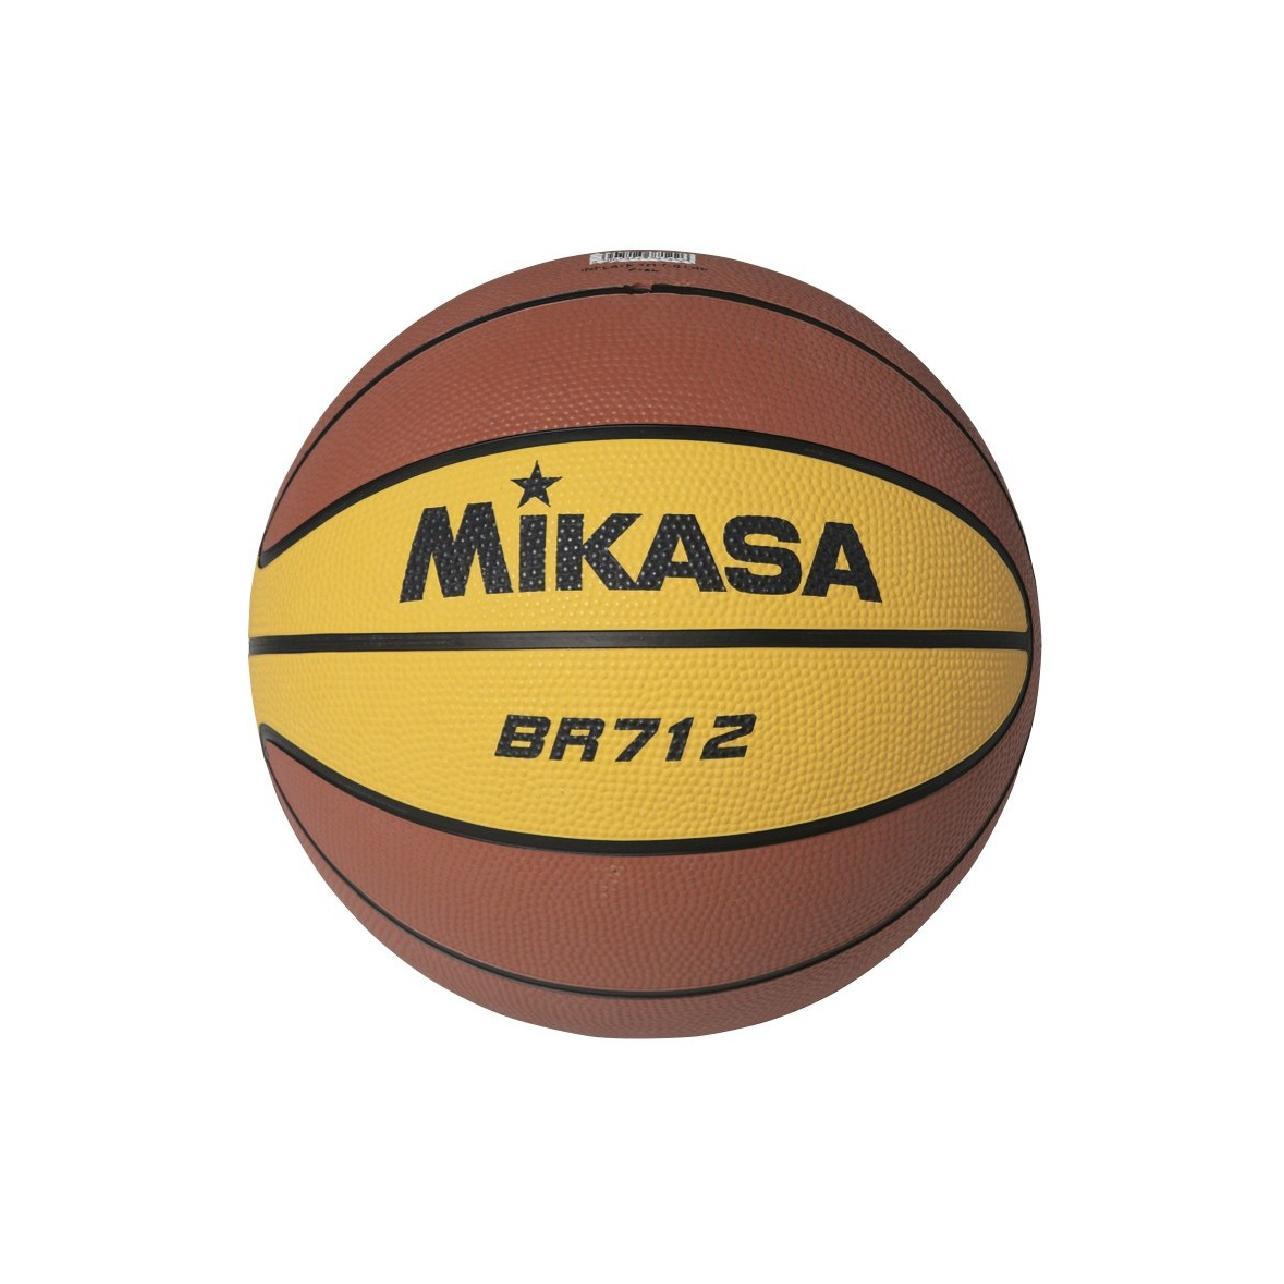 Mikasa Br712 Rubber Basketball